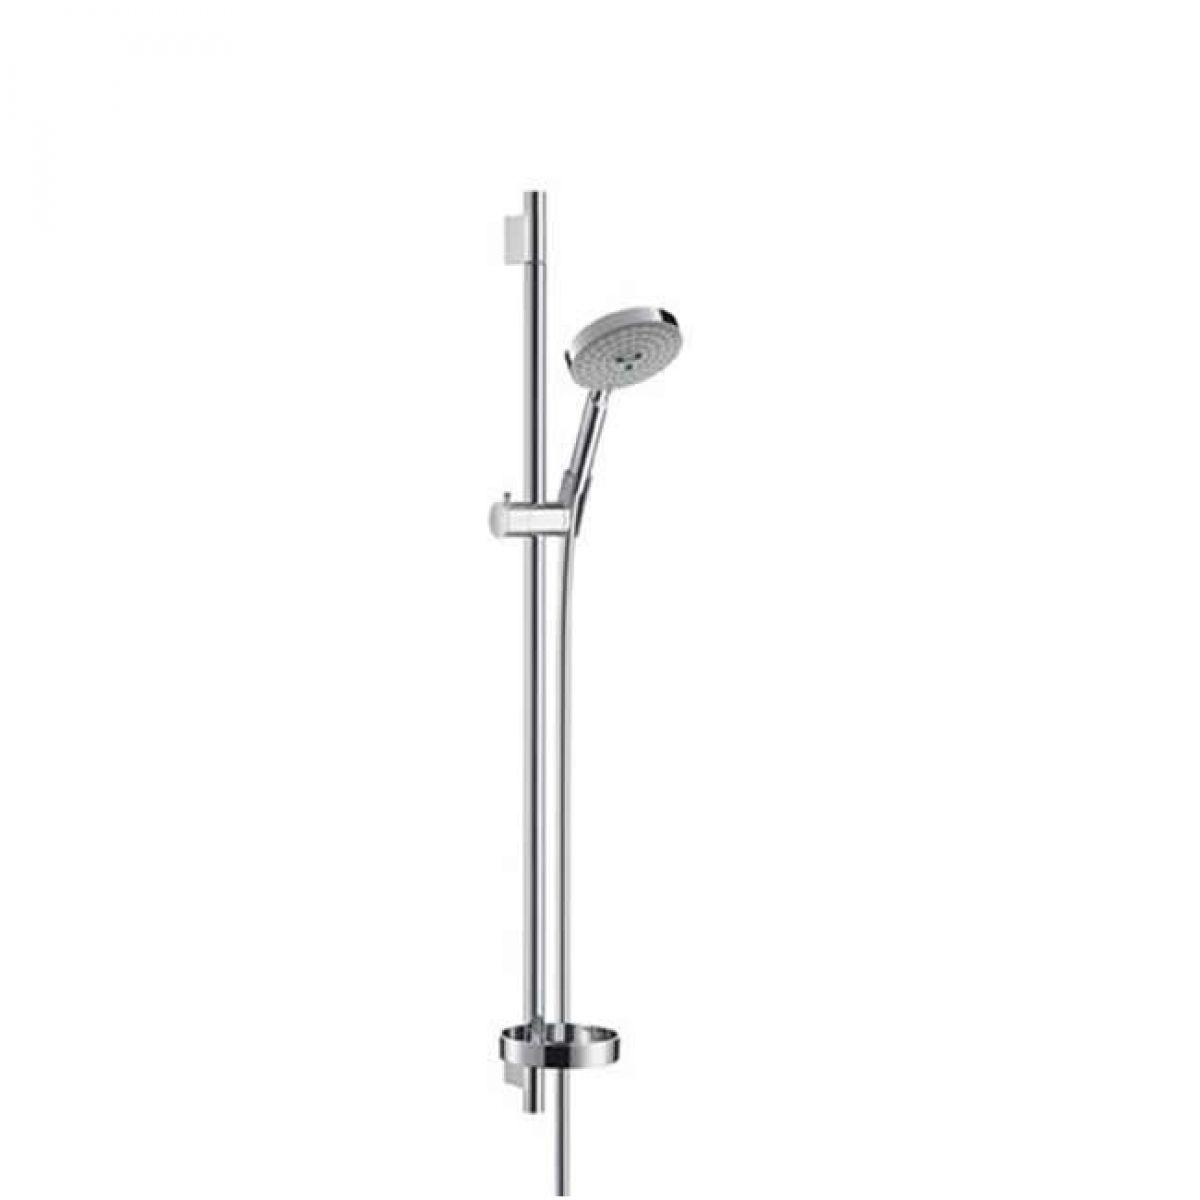 hansgrohe raindance s 150 air 3jet unica 39 s puro set uk bathrooms. Black Bedroom Furniture Sets. Home Design Ideas